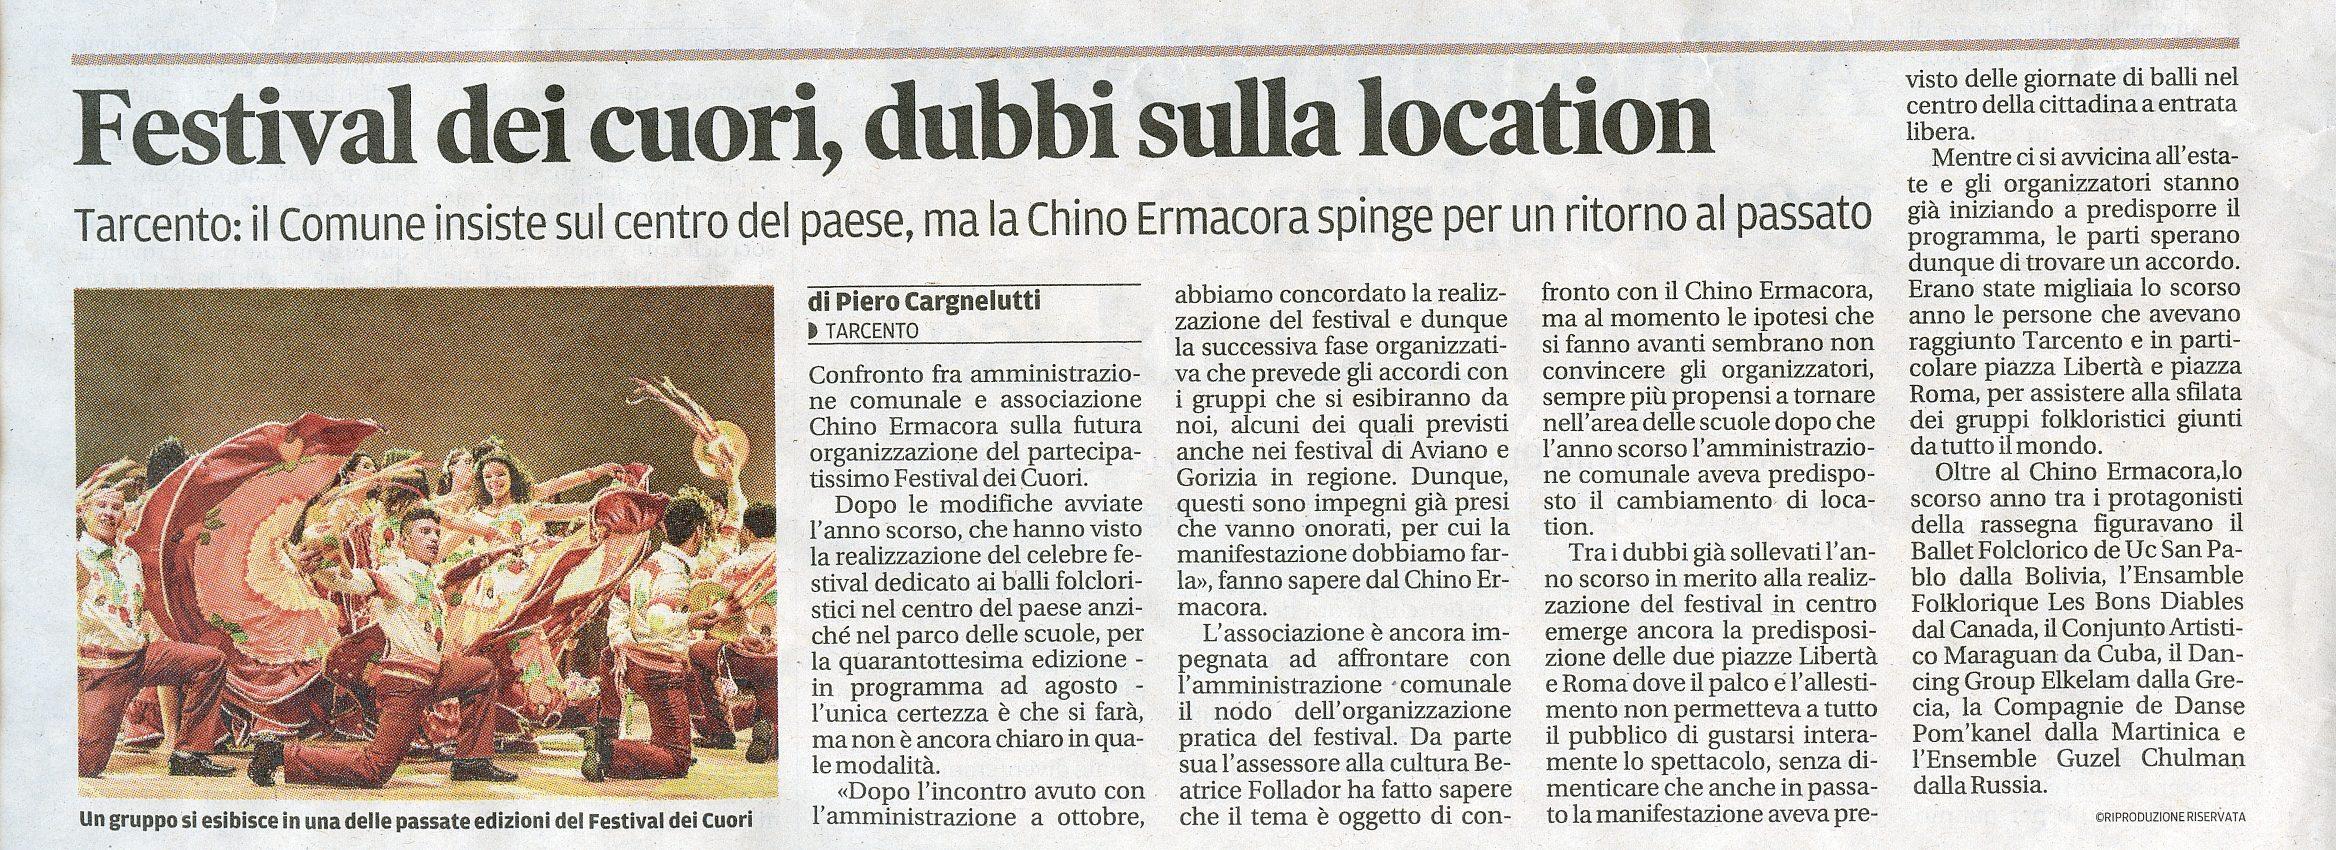 Messaggero Veneto 15.04.2017